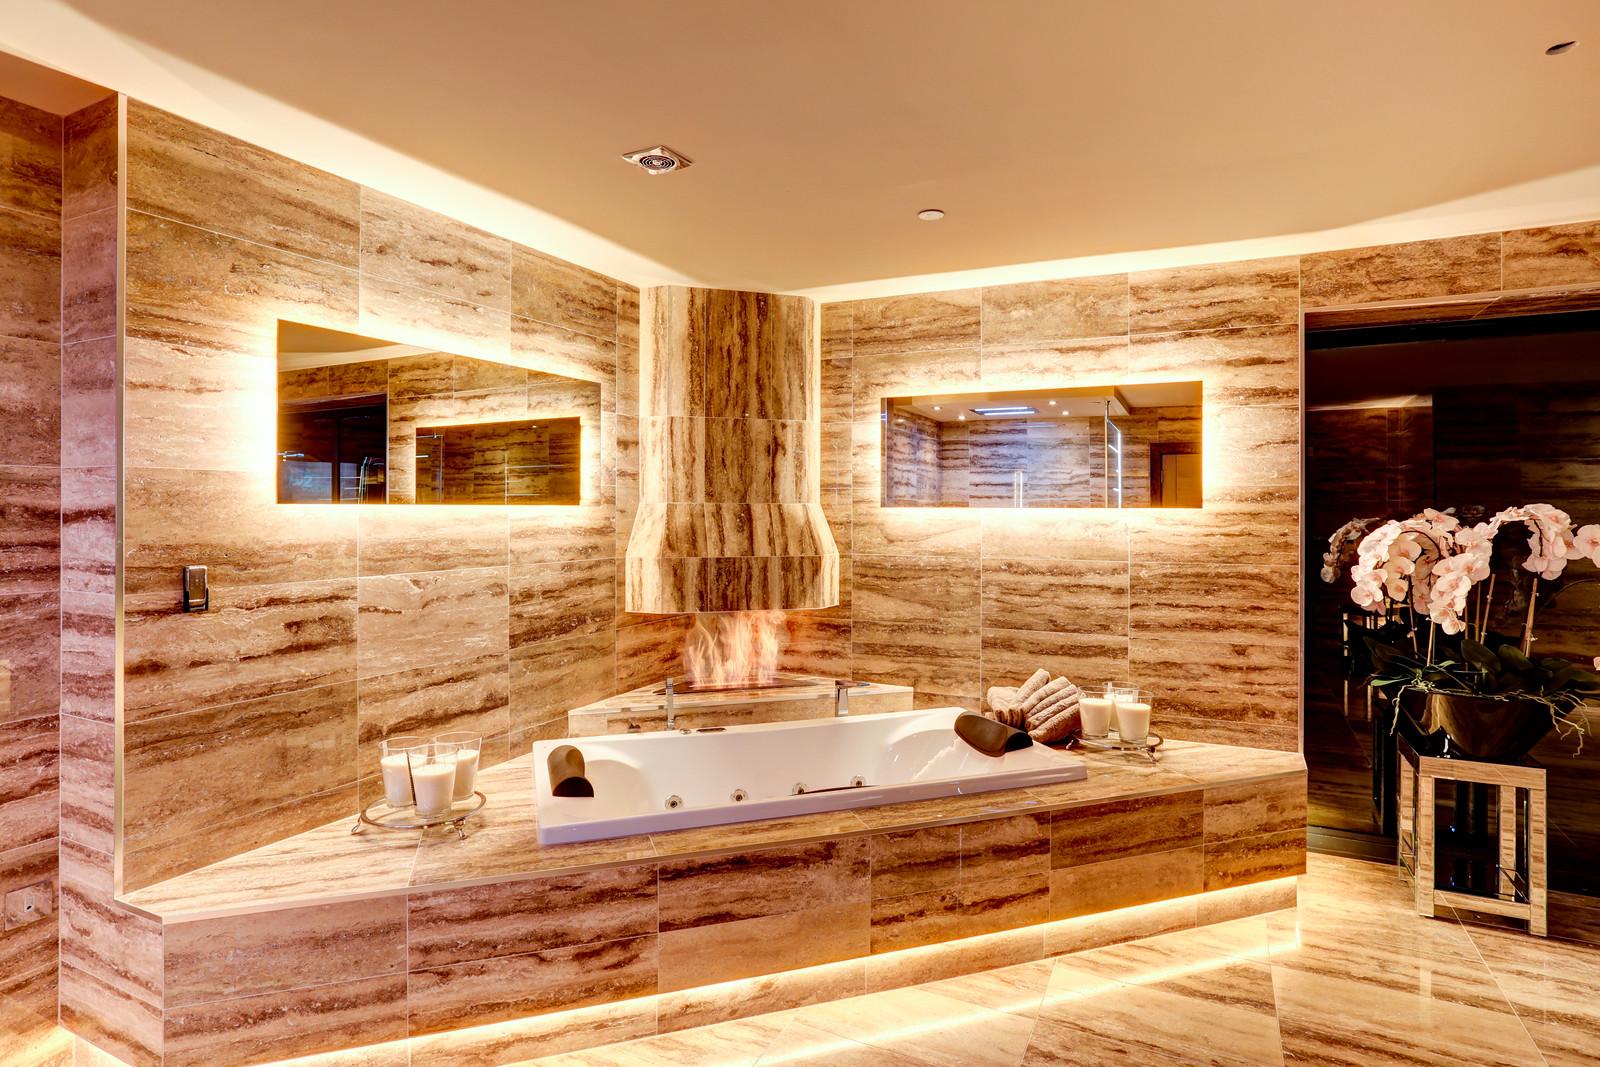 Luxurious bathroom, Tanglewood, Colston Bassett, Nottinghamshire